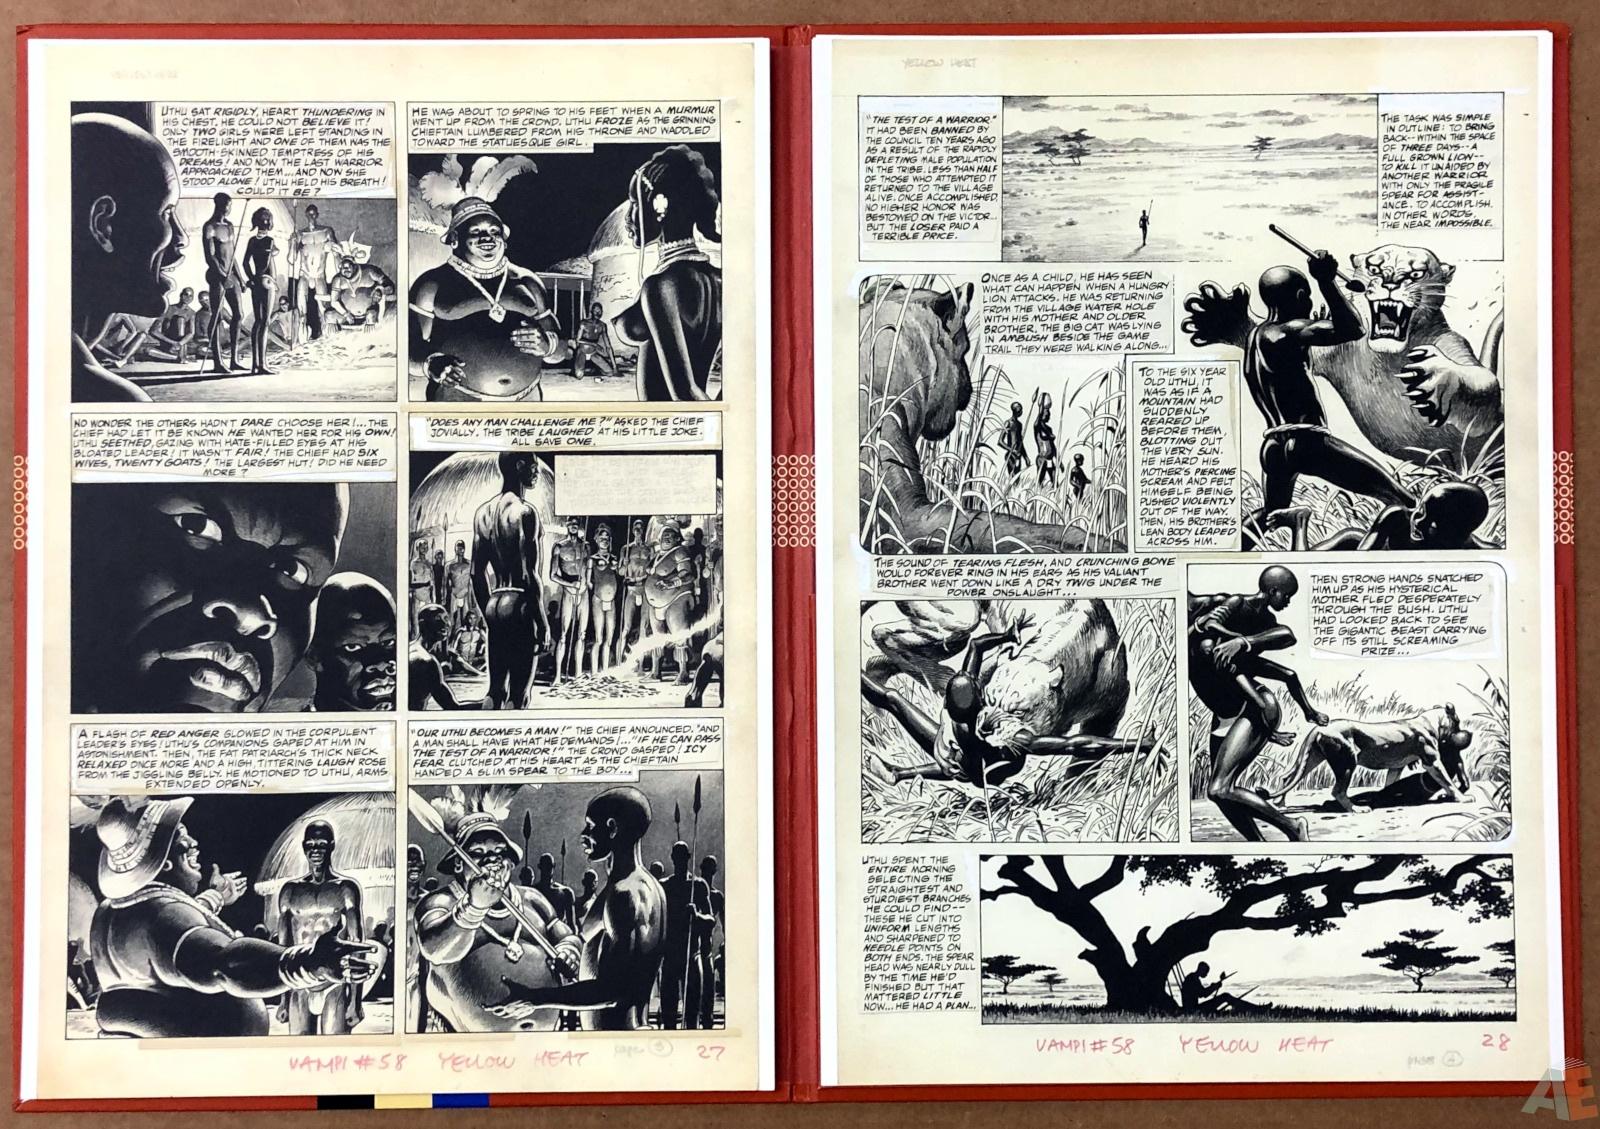 Russ Heath's Yellow Heat Artist's Edition Portfolio 8